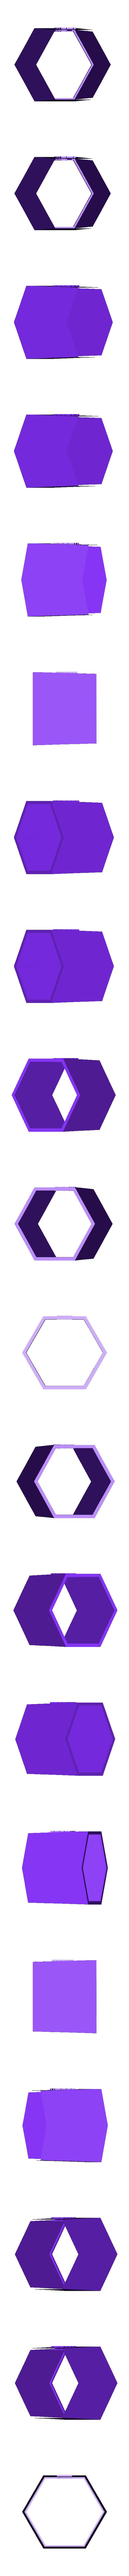 LH_hexa_body2_fixed_unten.stl Download free STL file Lighthouse • 3D printing template, jteix